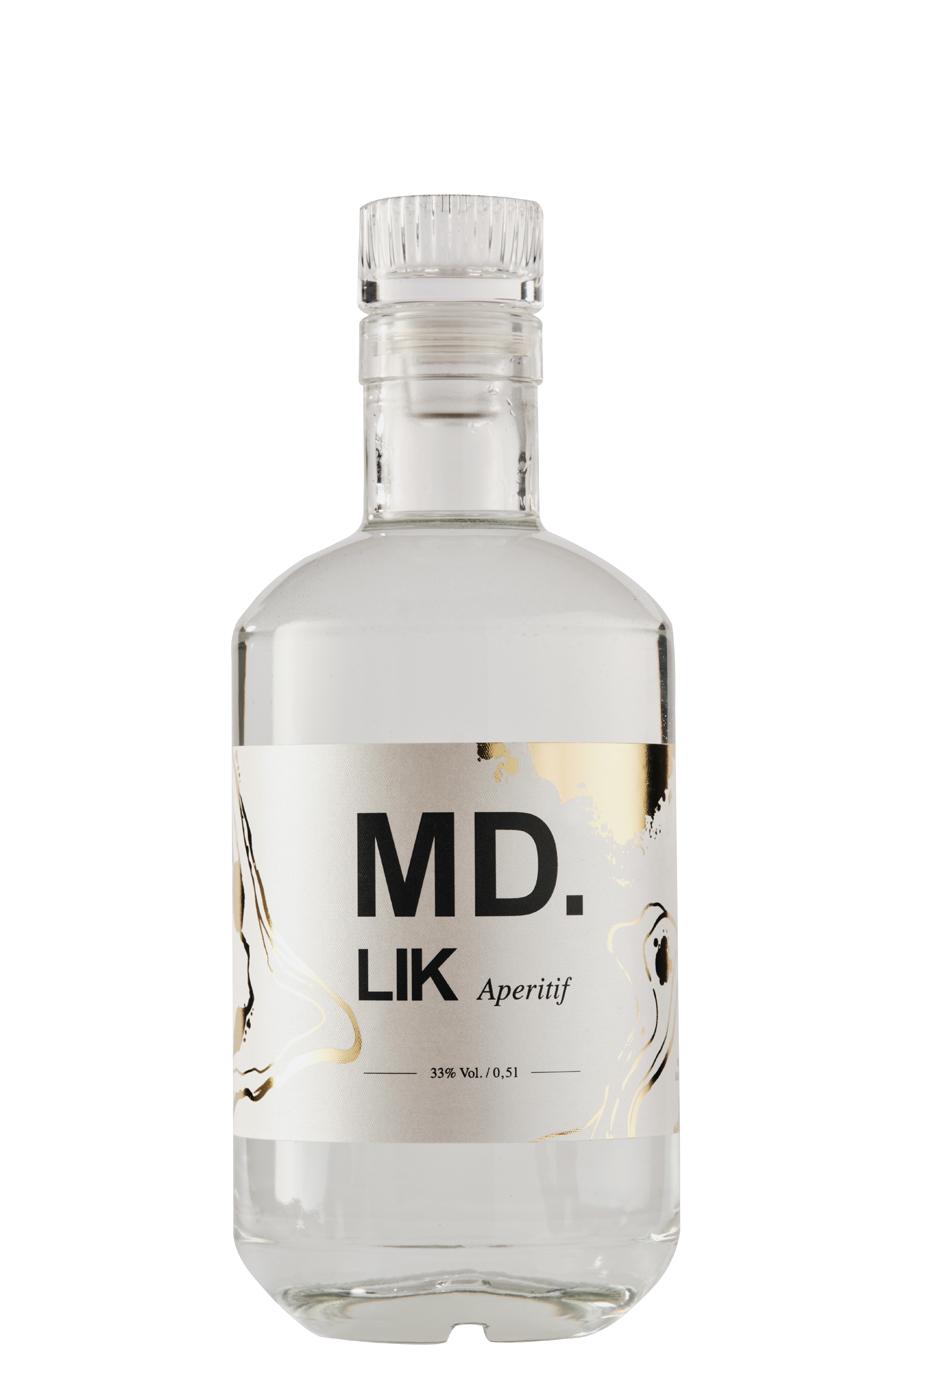 MD.Lik Aperitif